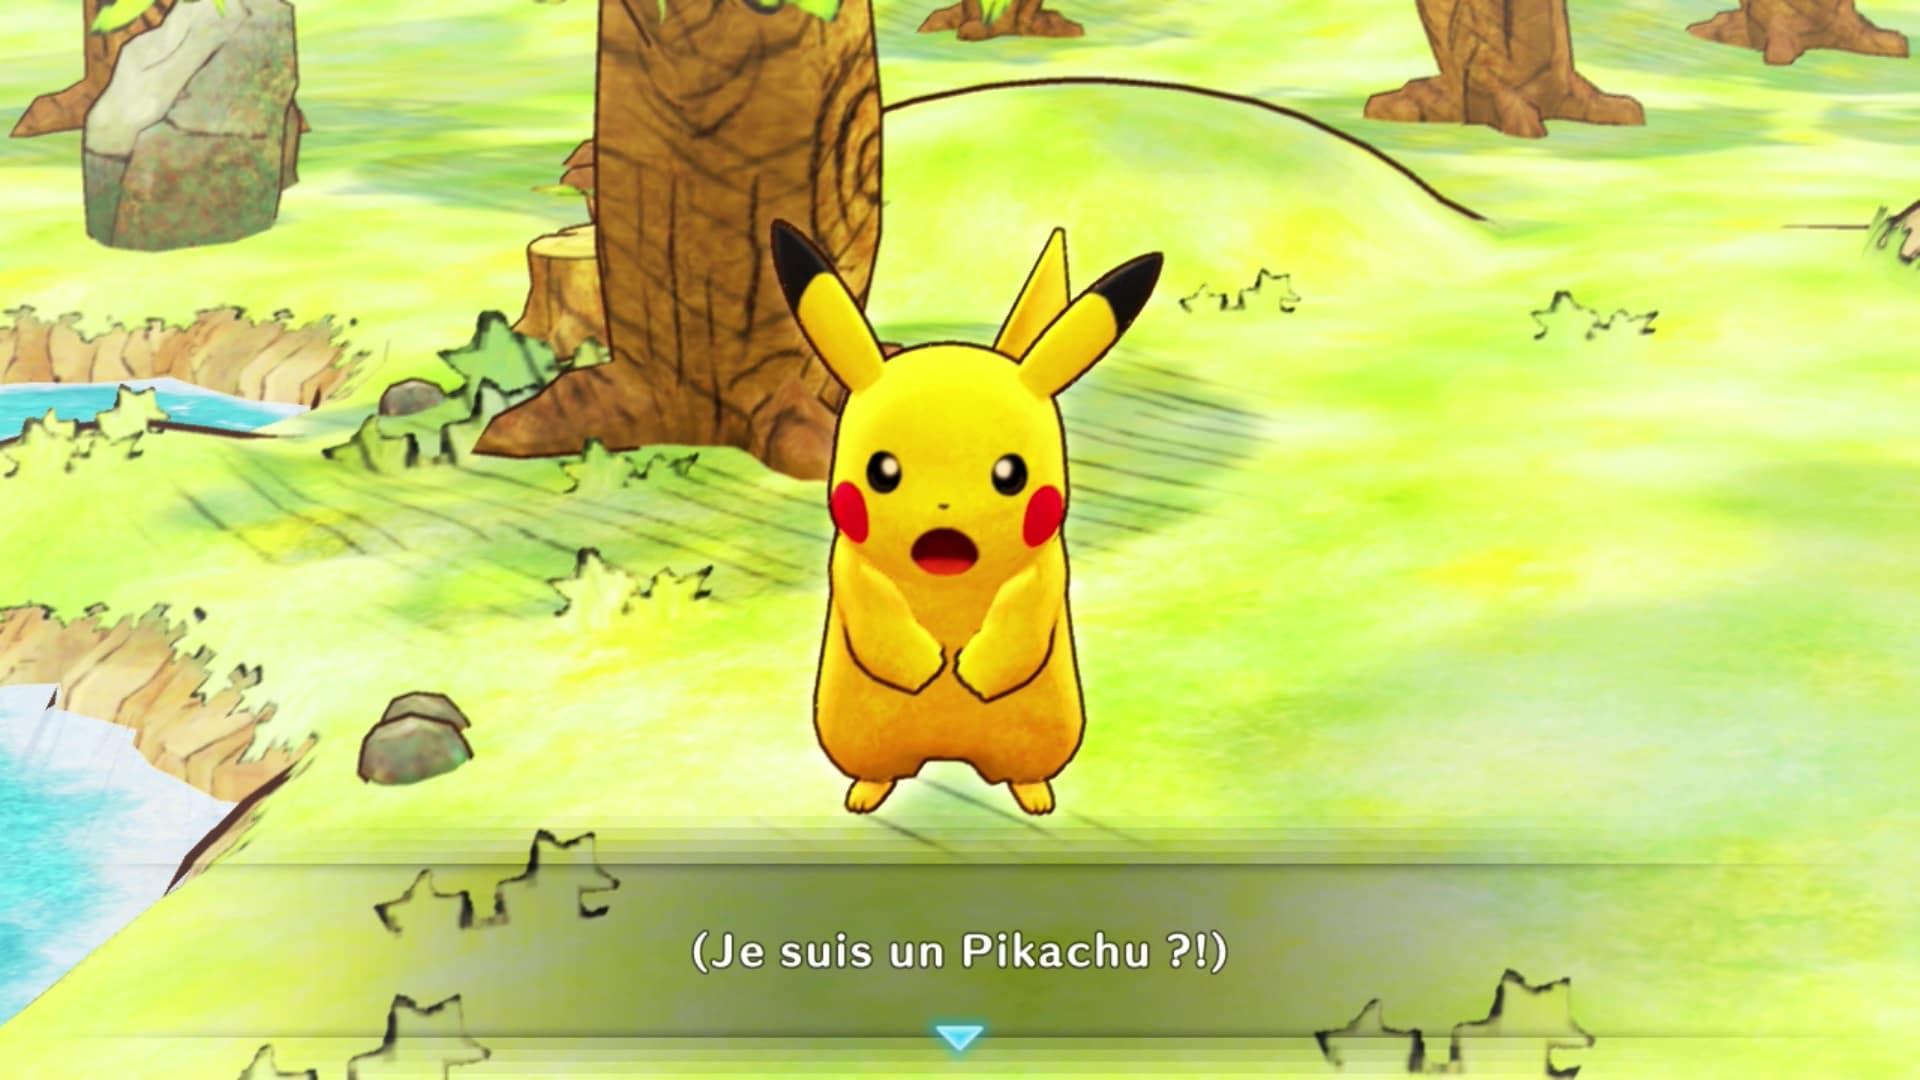 Pokémon Donjon Mystère Equipe de Secours DX Nintendo Switch